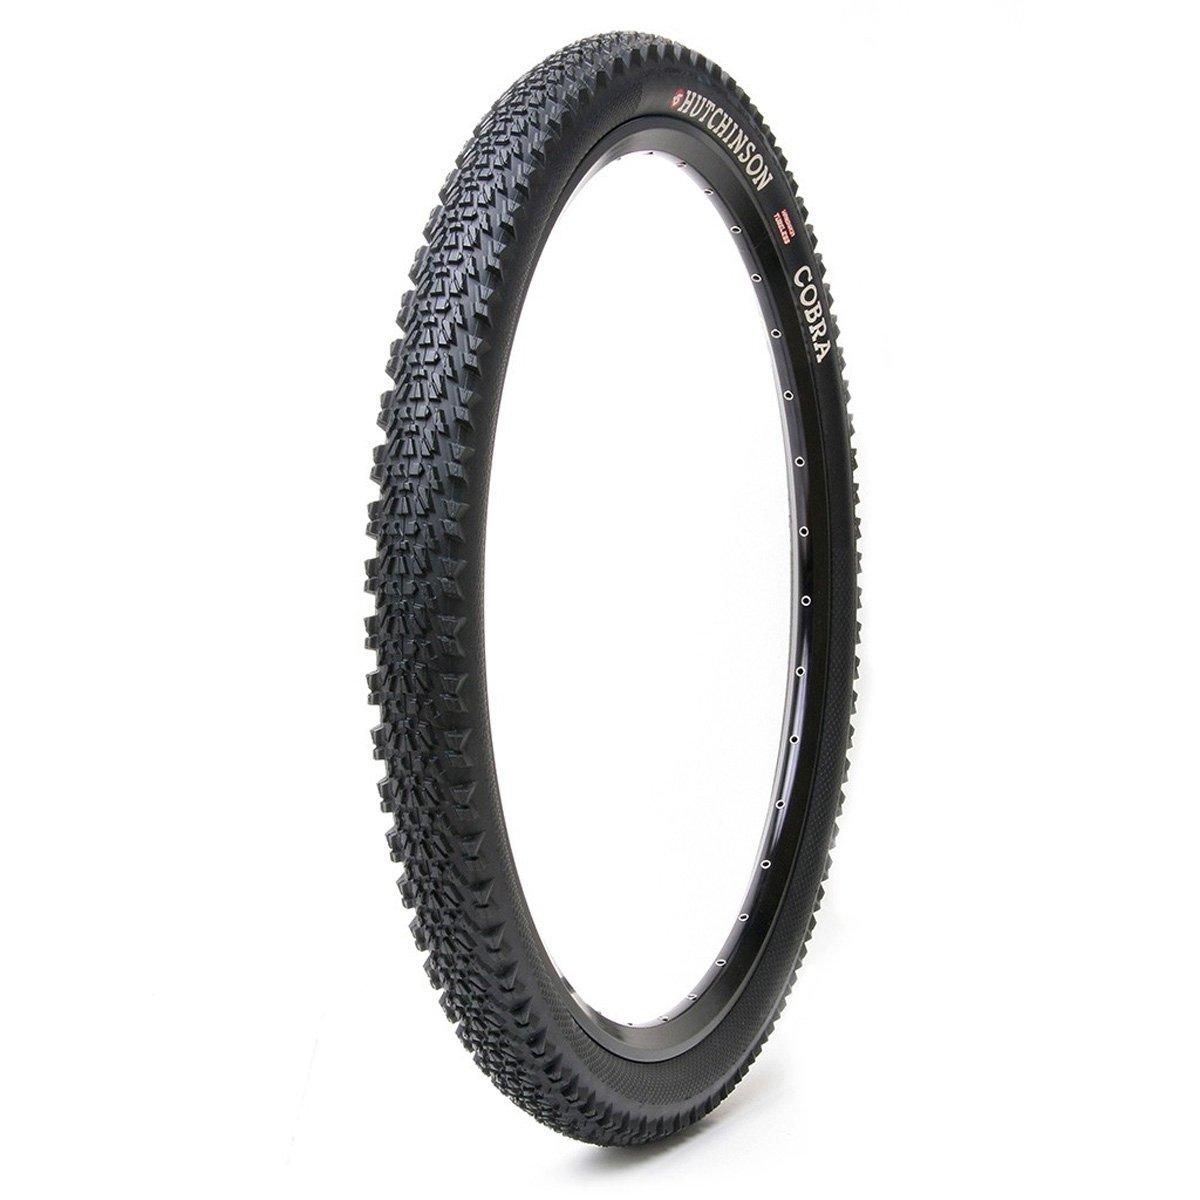 Black - 29 x 2.10 Hutchinson Cobra Wire Bead Mountain Bicycle Tire